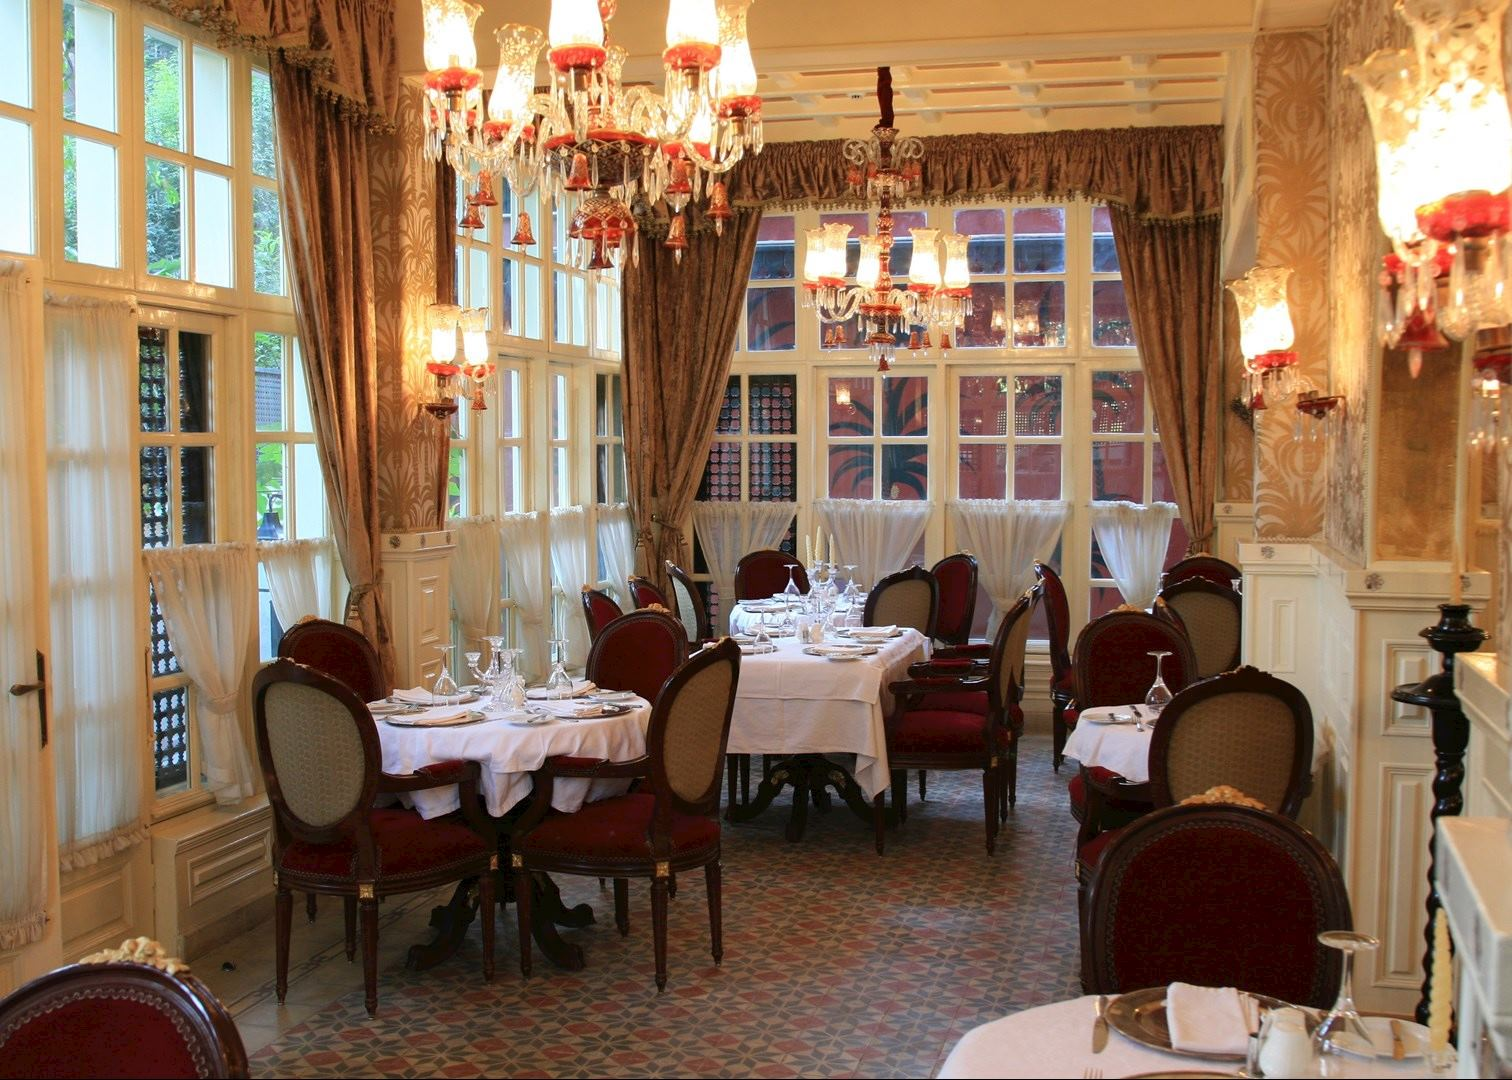 Villa belle epoque hotels in cairo audley travel for Epoque hotel